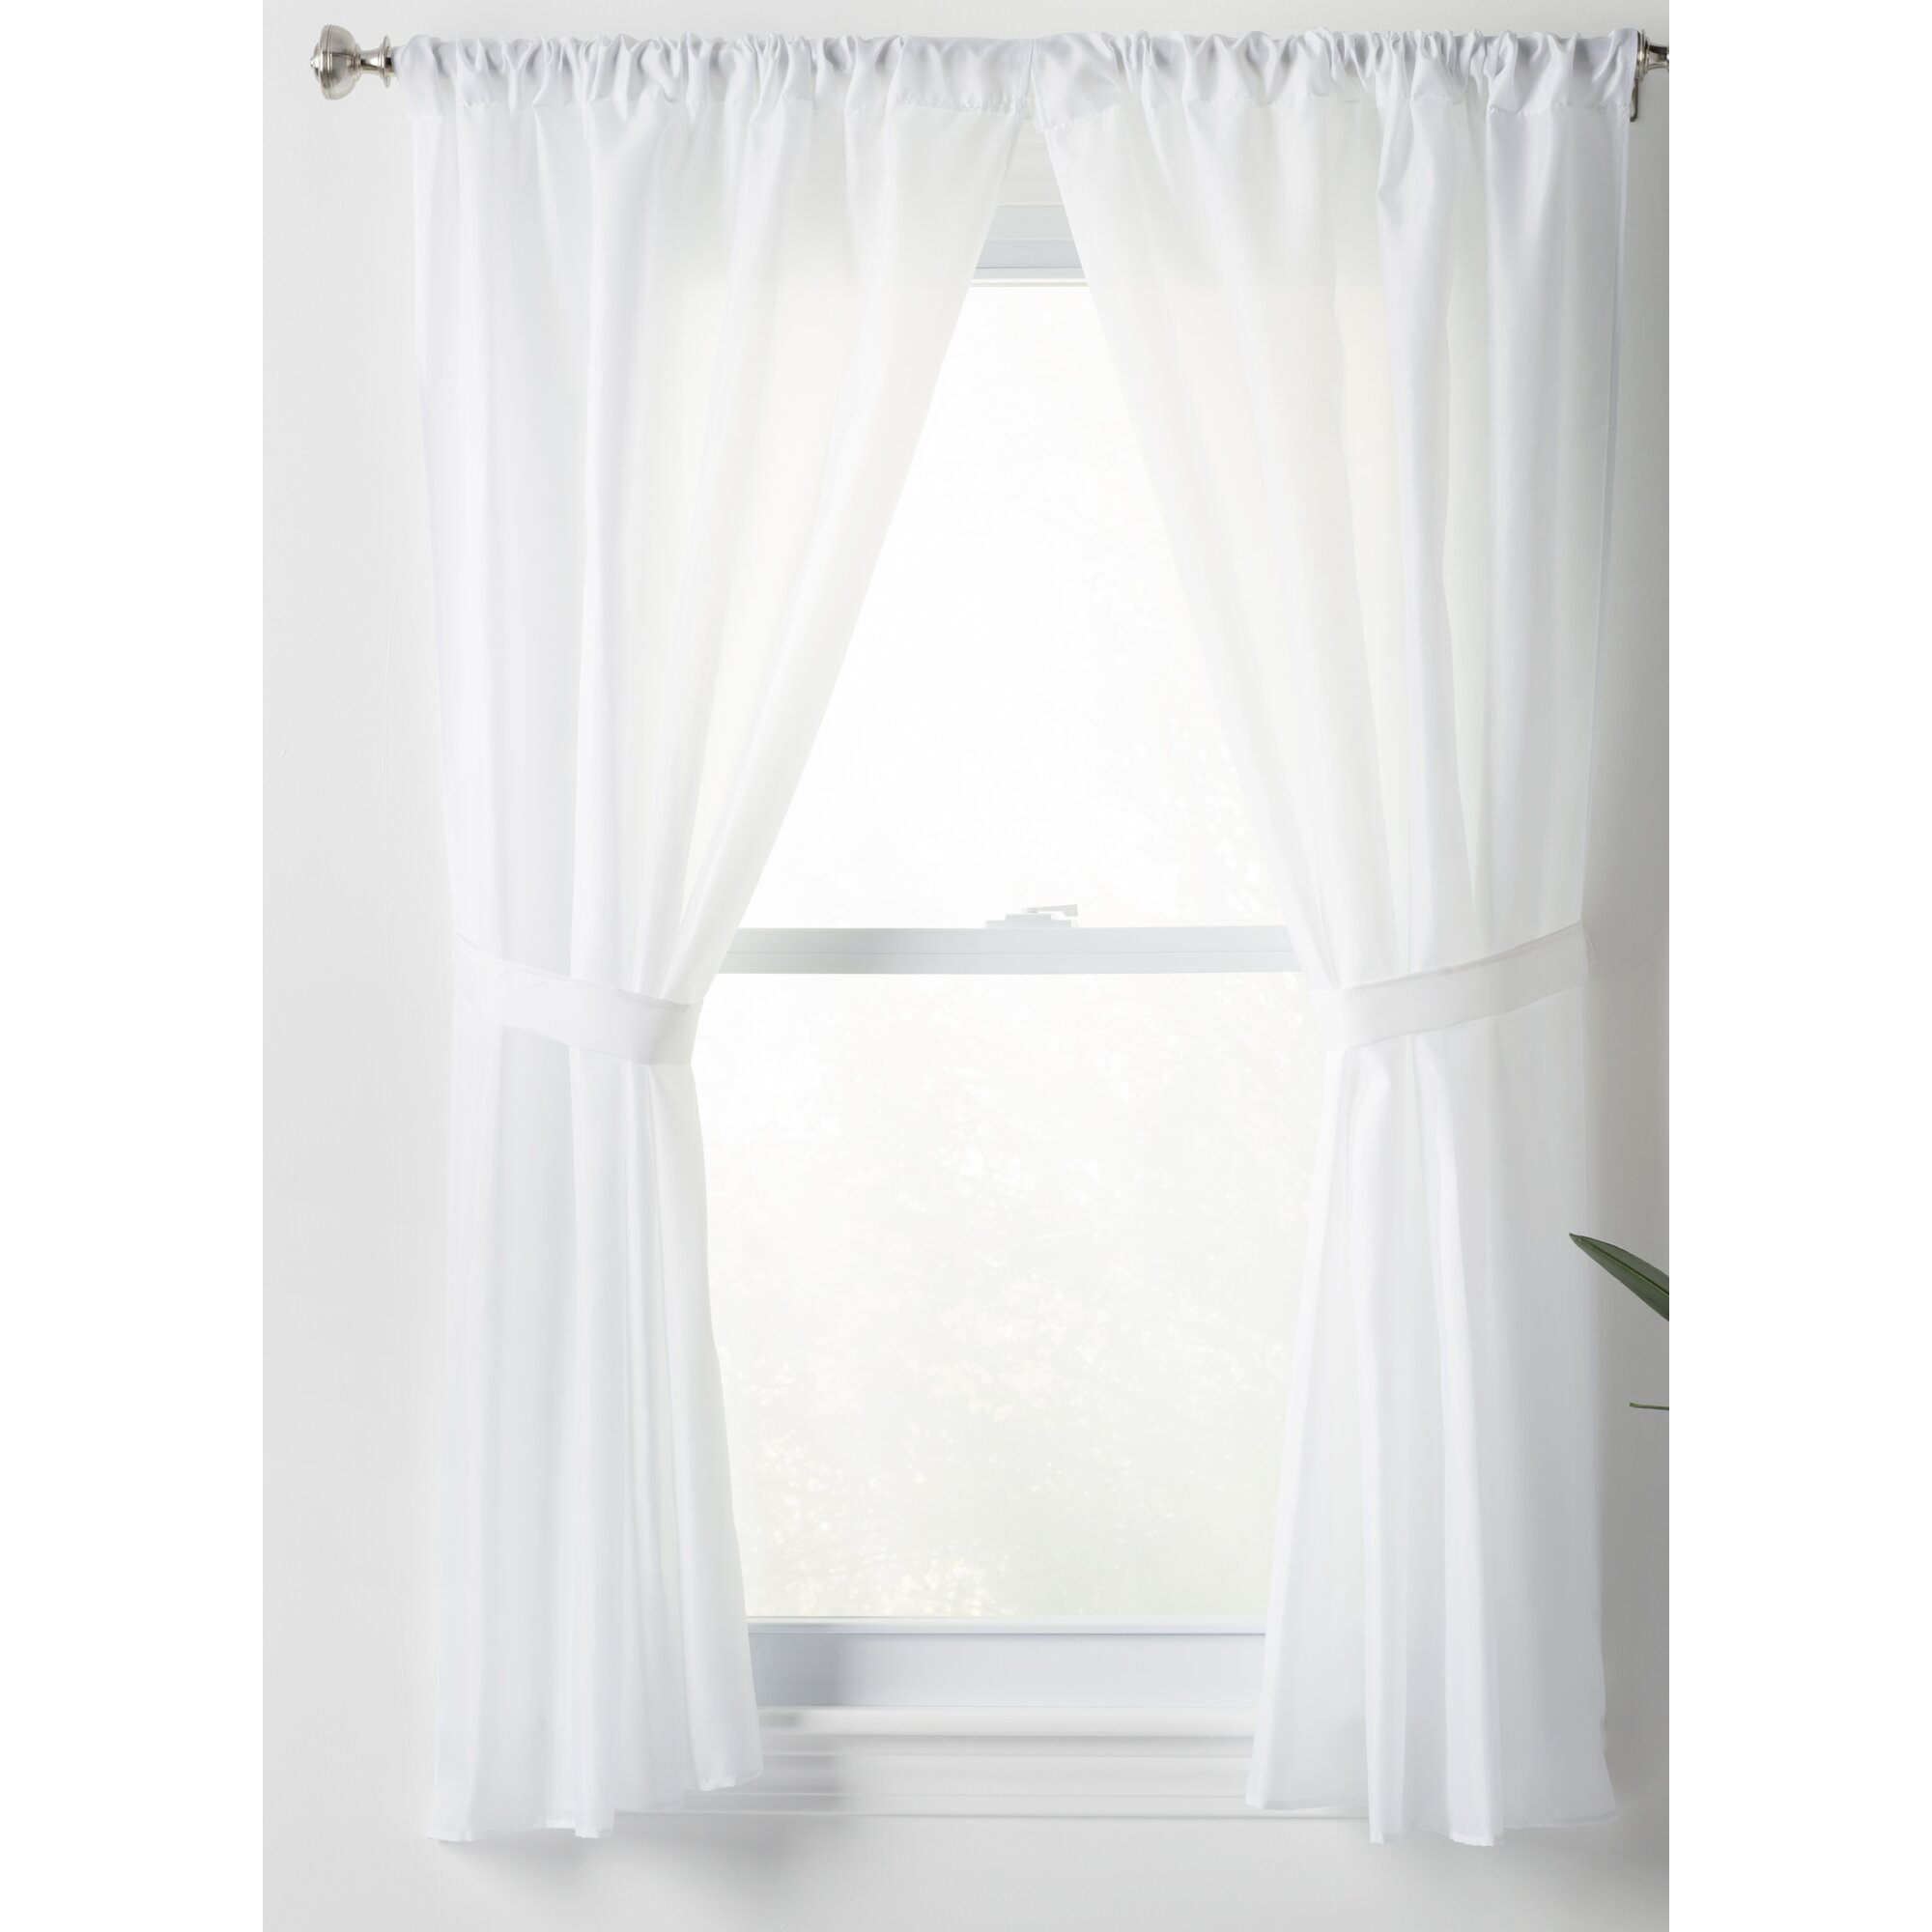 Bathroom sheer curtains